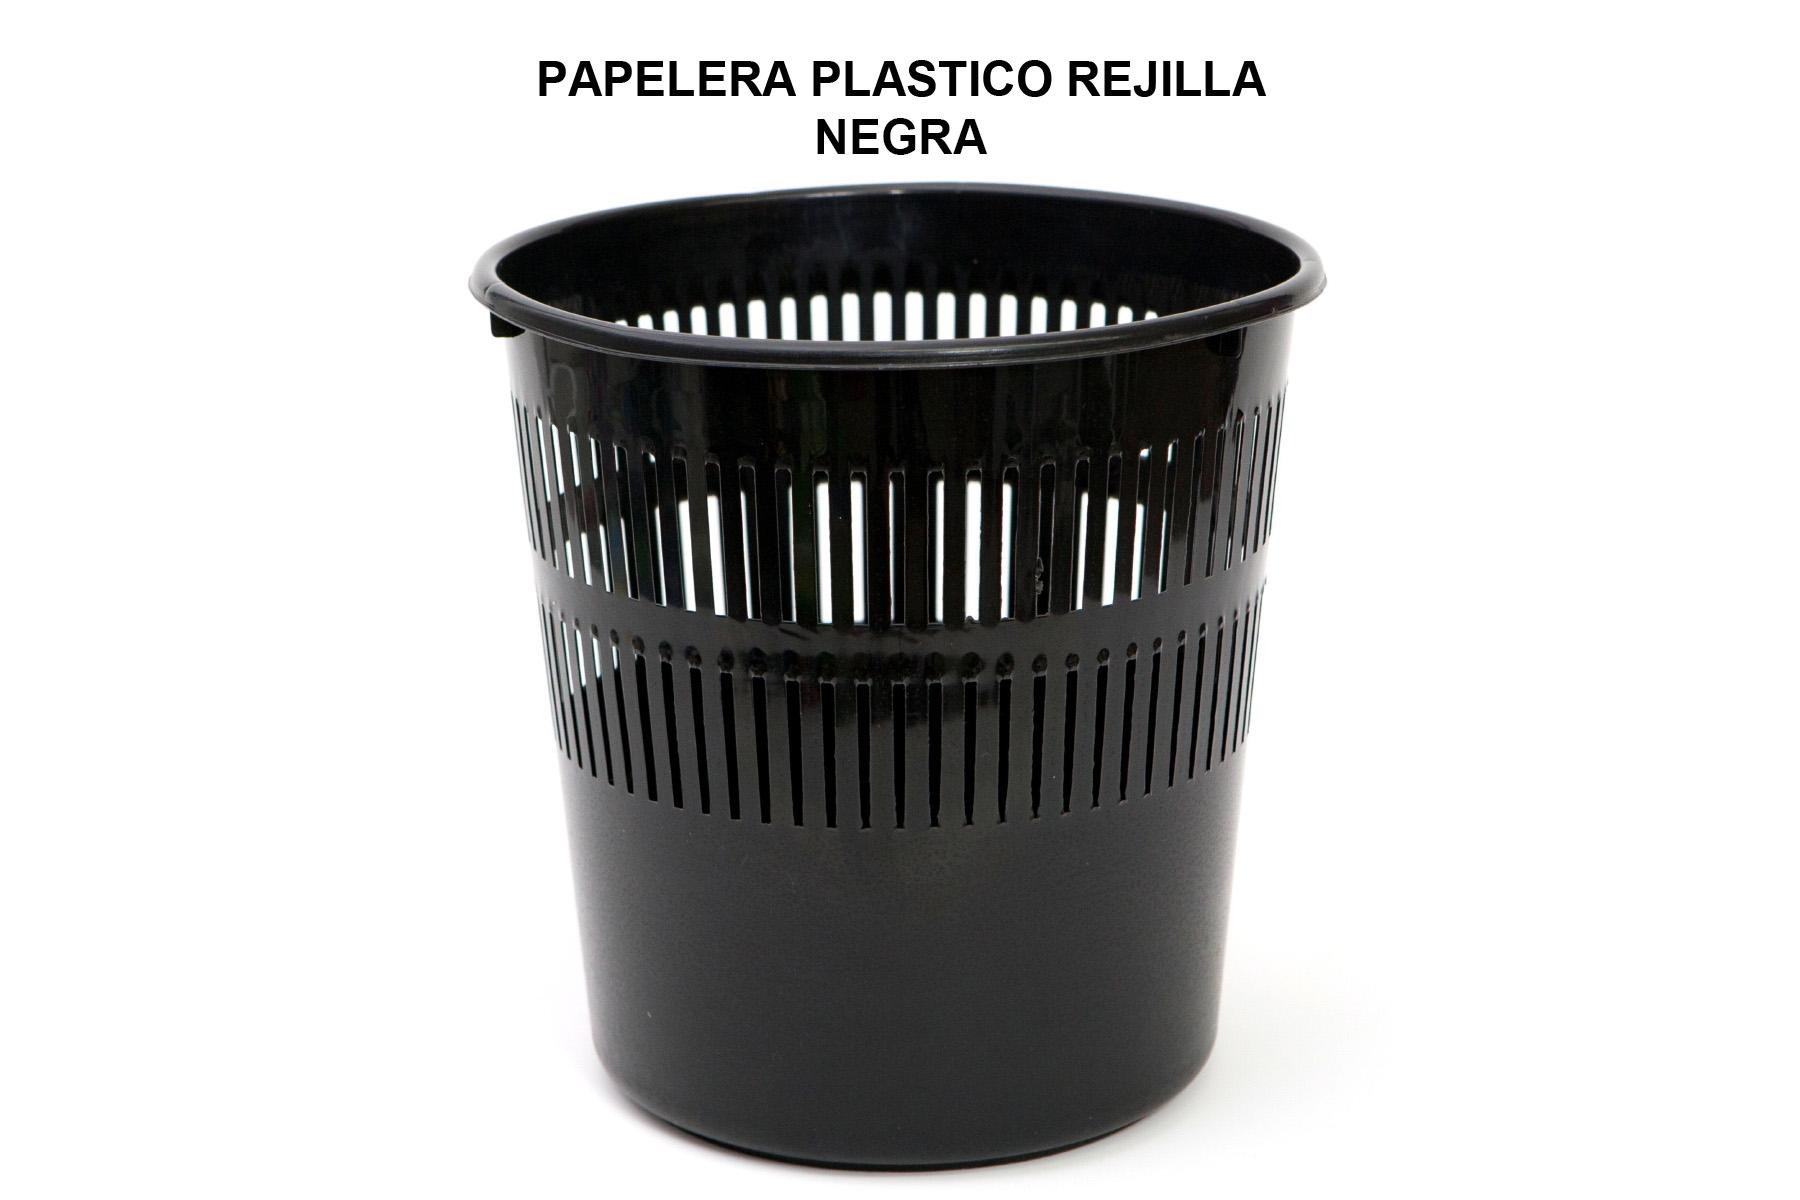 PAPELERA PLASTICO REJILLA NEGRA